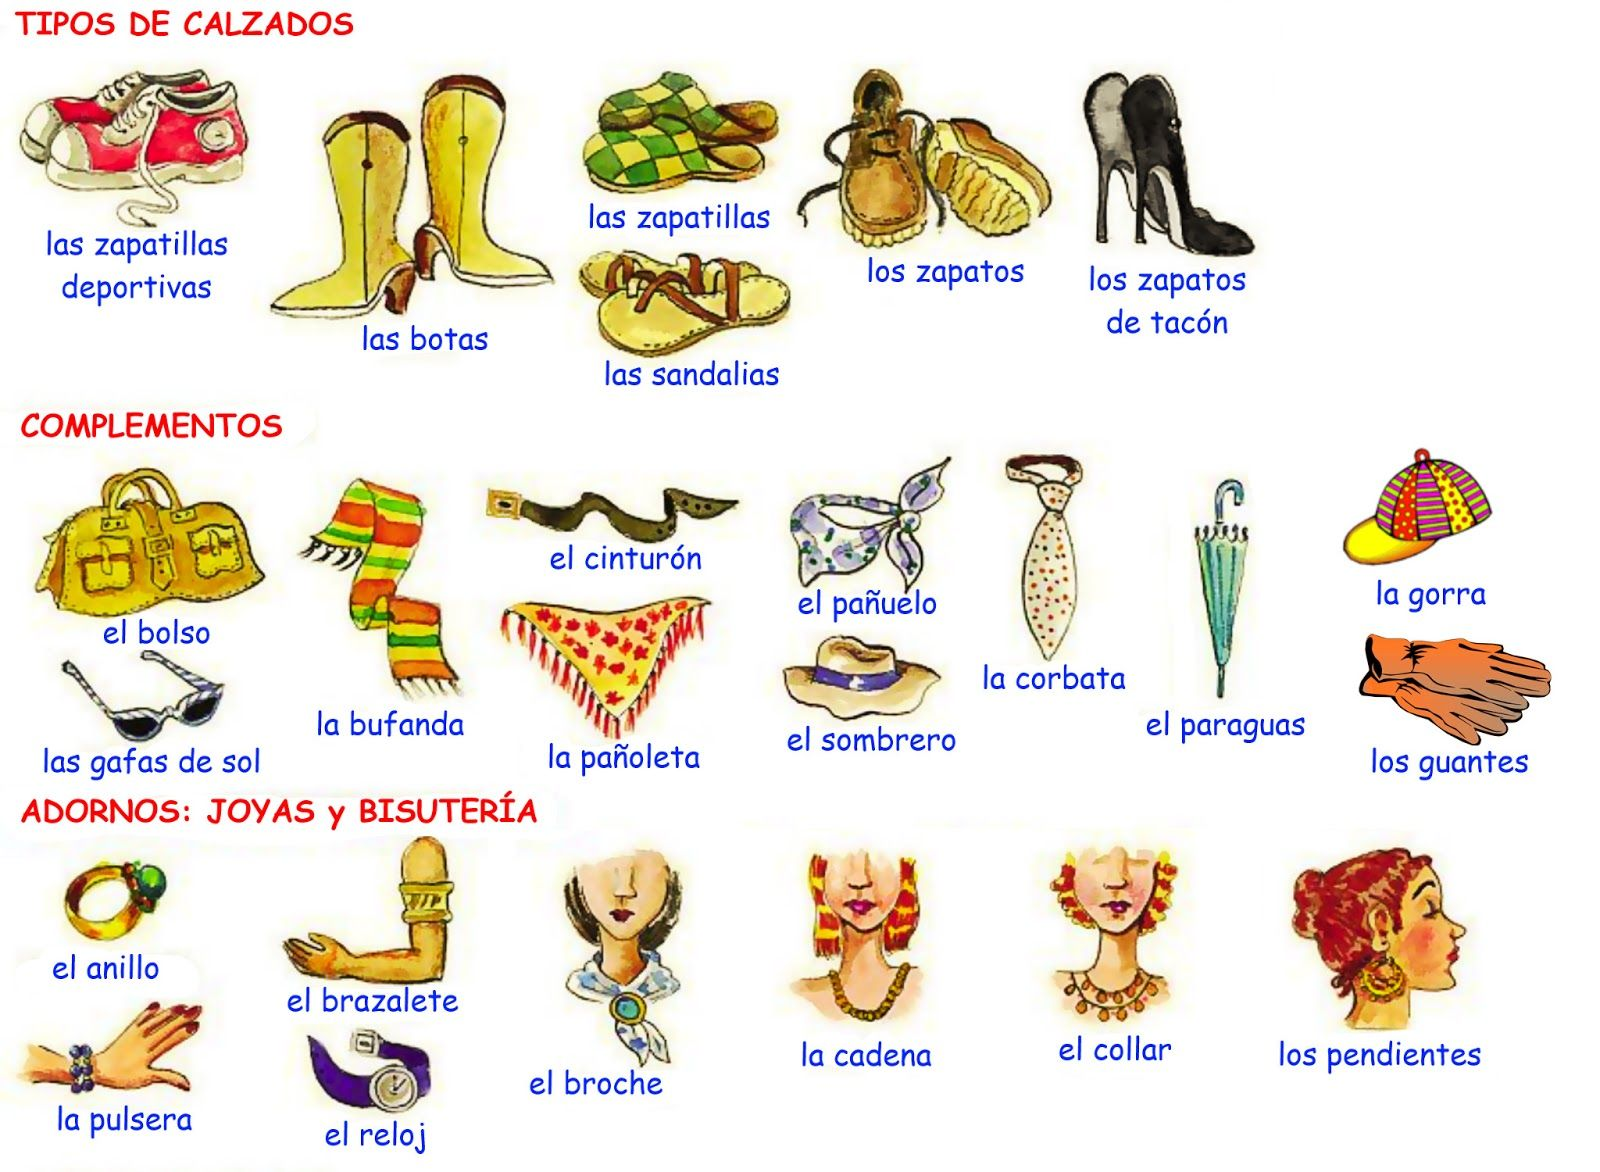 cff9a232987acdfa1709dcd36b03a3e2 me encanta escribir en español la ropa calzados, accesorios y